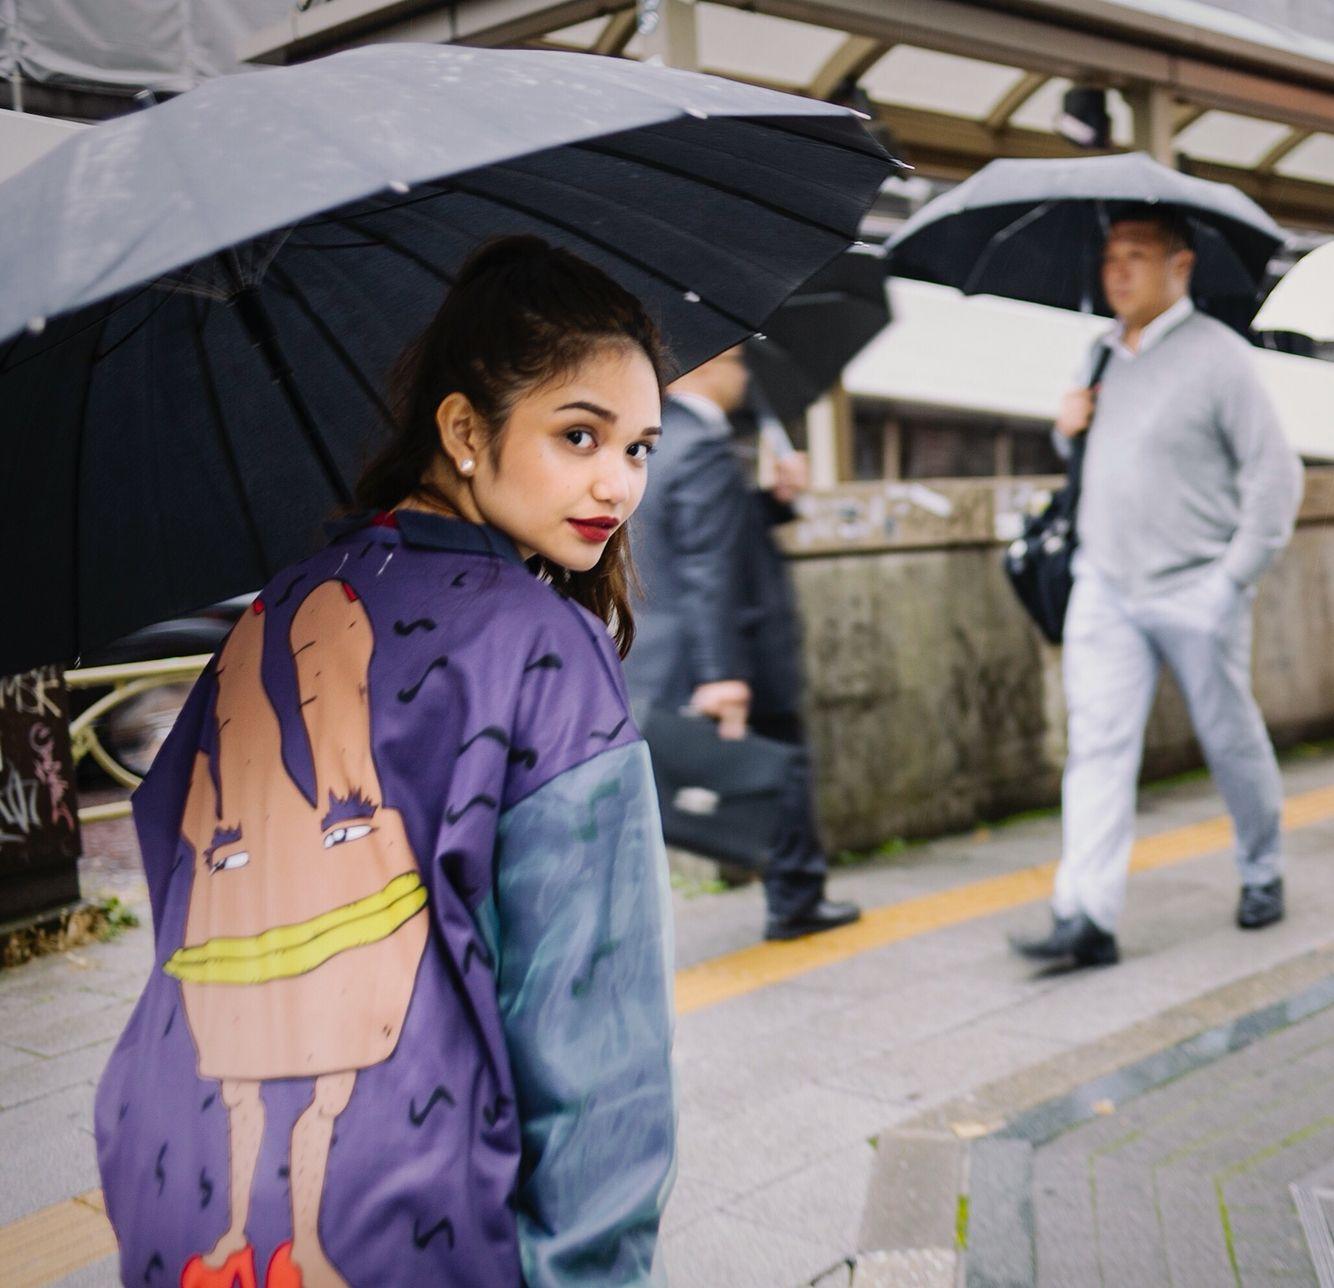 #outdoorshoot #outdoorportrait #photoshoot #harajukufashion #streetstyle #tokyofashion #redlips #art #outdoorphotoshootwomen #asian #hispanic #portrait